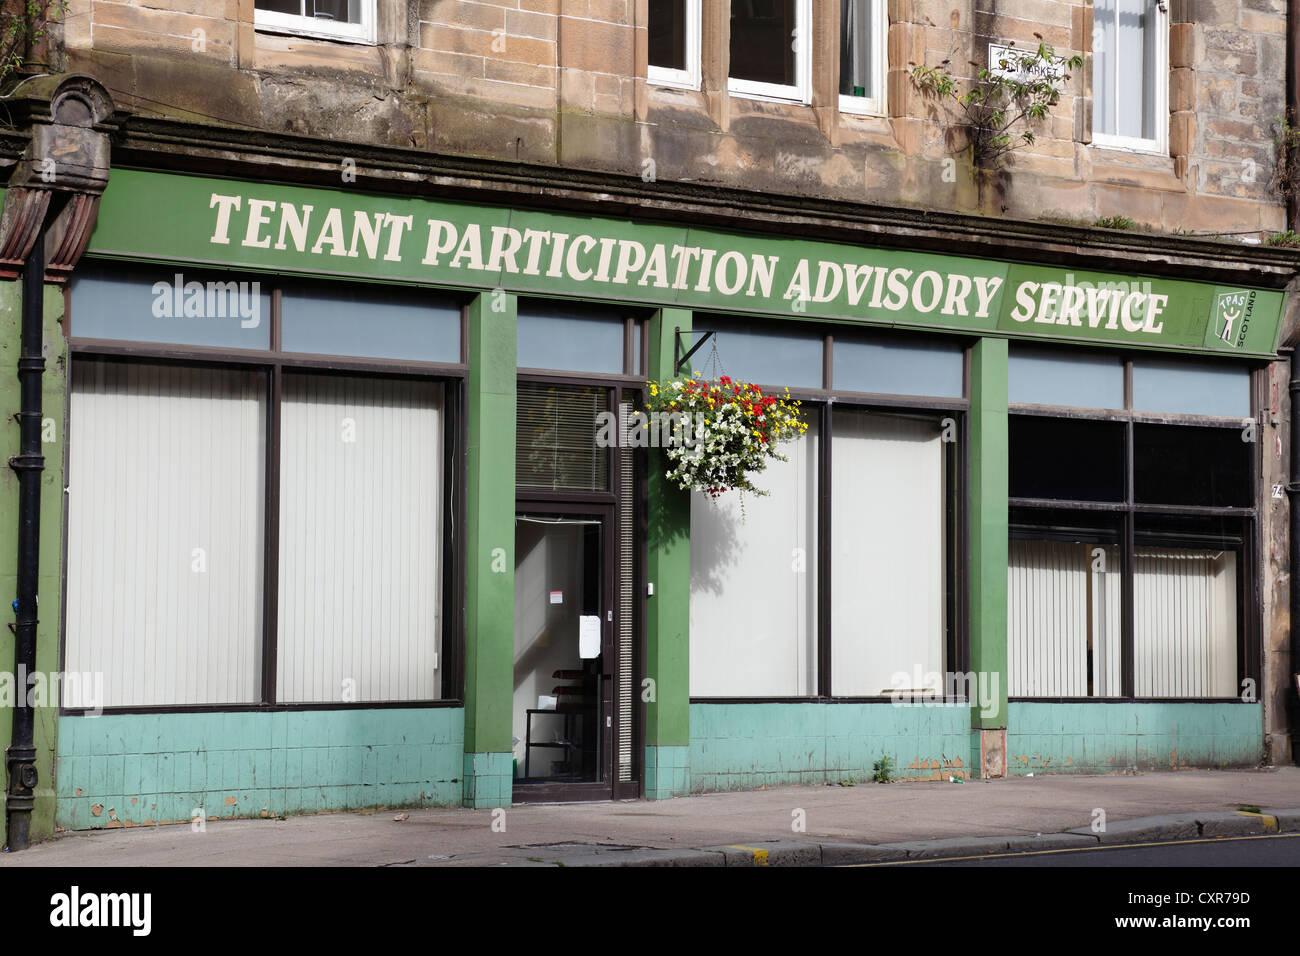 National Tenant and Landlord Participation Advisory service for Scotland, Glasgow, Scotland, UK - Stock Image